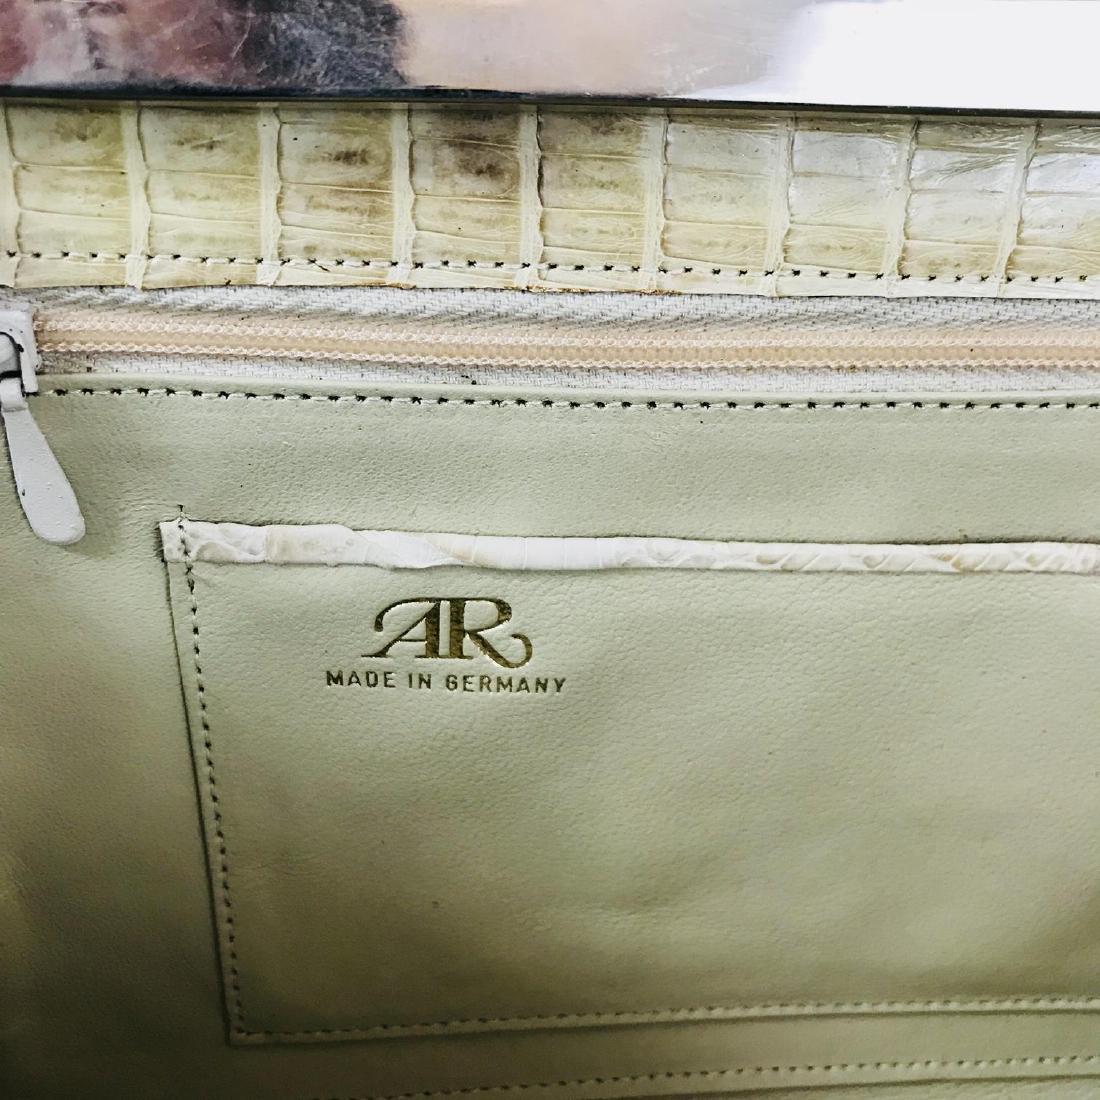 Vintage Beige Crocodile Leather Clutch Bag - 8